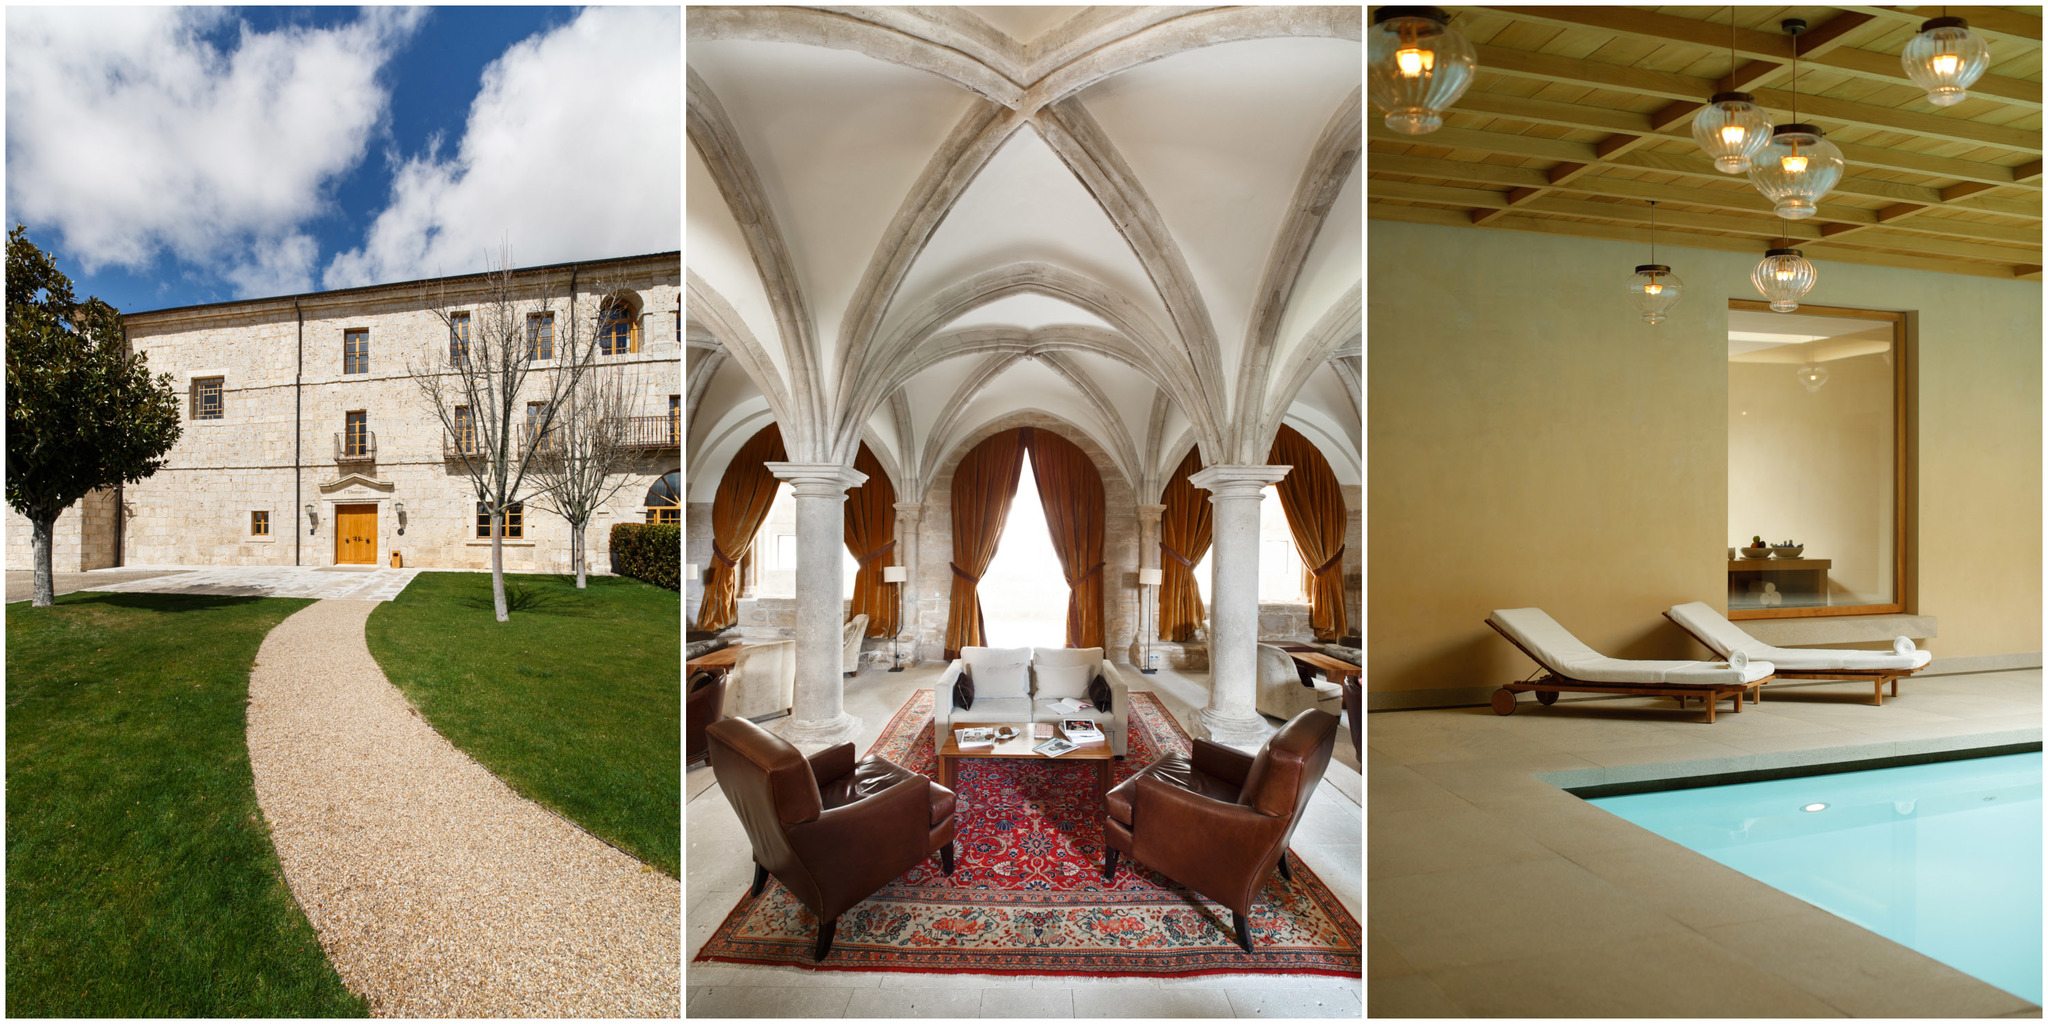 Abadía Retuerta-Le Domaine